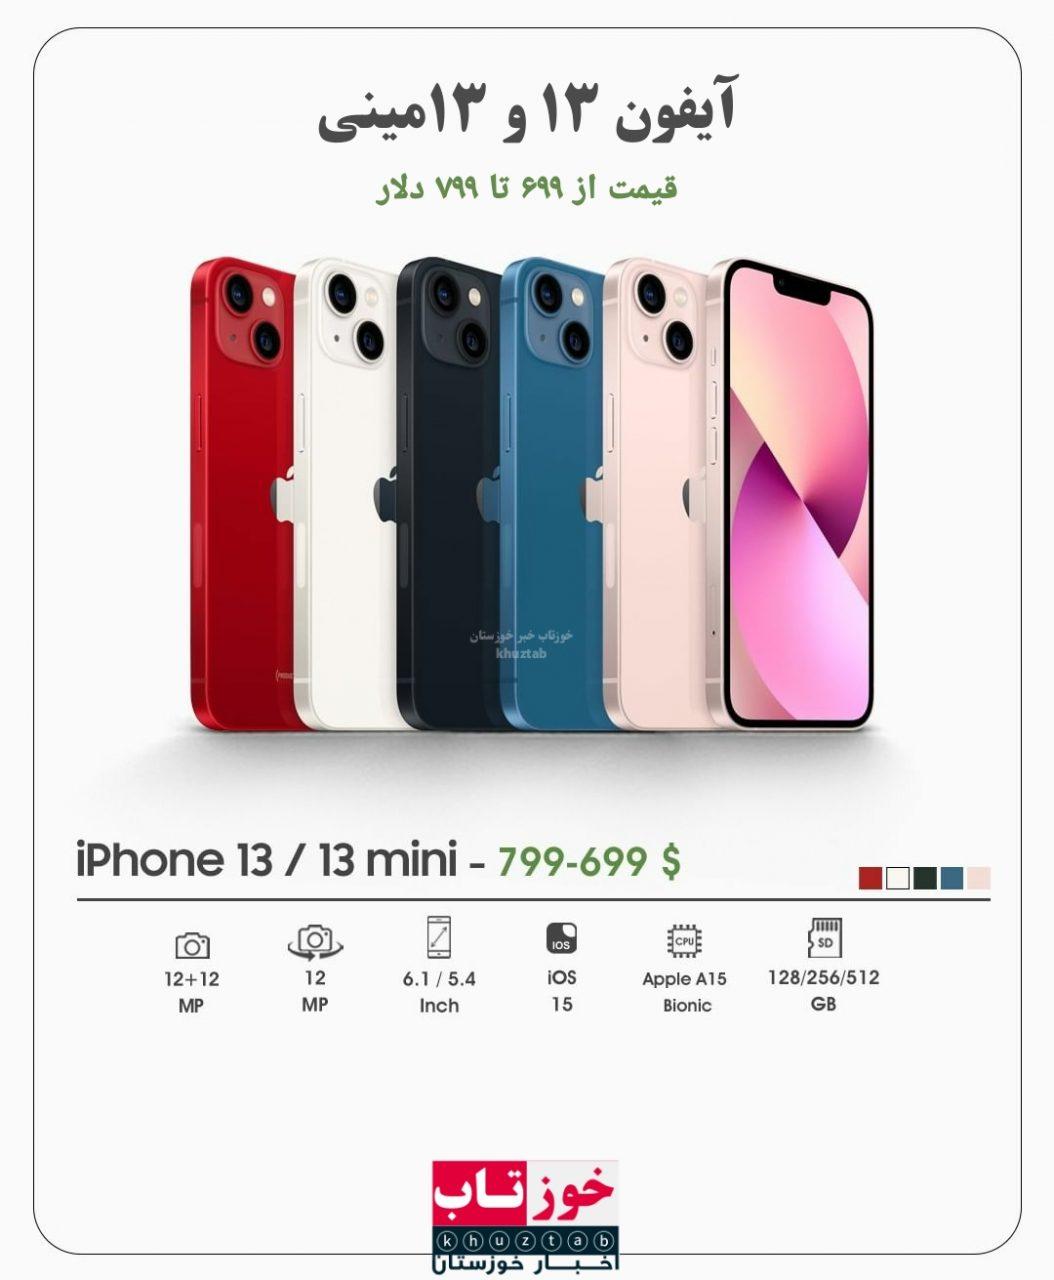 PicsArt 09 15 07.24.30 1054x1280 محصولات جدید اپل رونمایی شد/ از آیفون های سری ۱۳ تا آیپد مینی و اپلواچ سری ۷